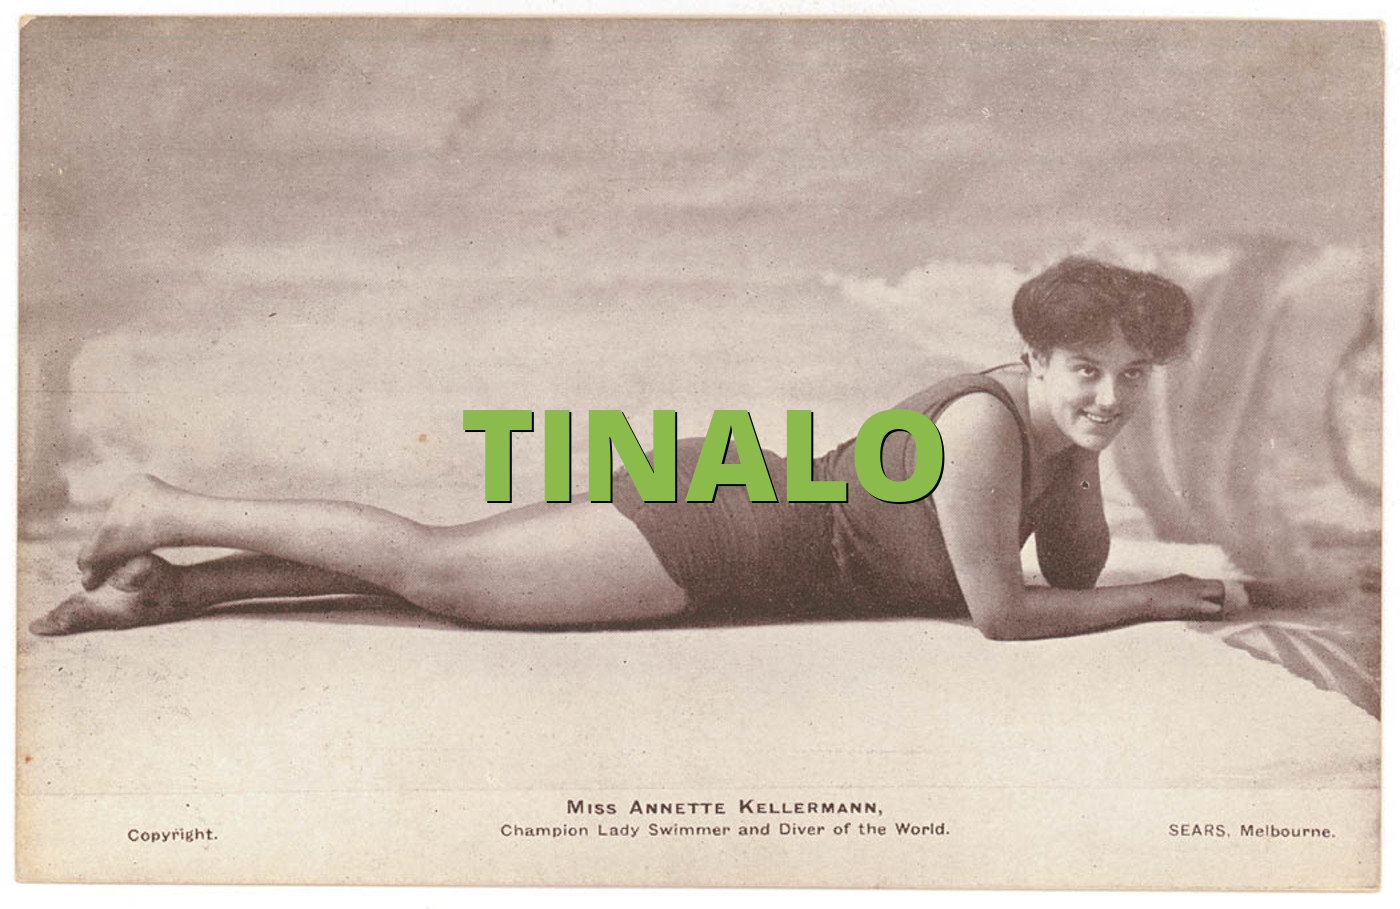 TINALO